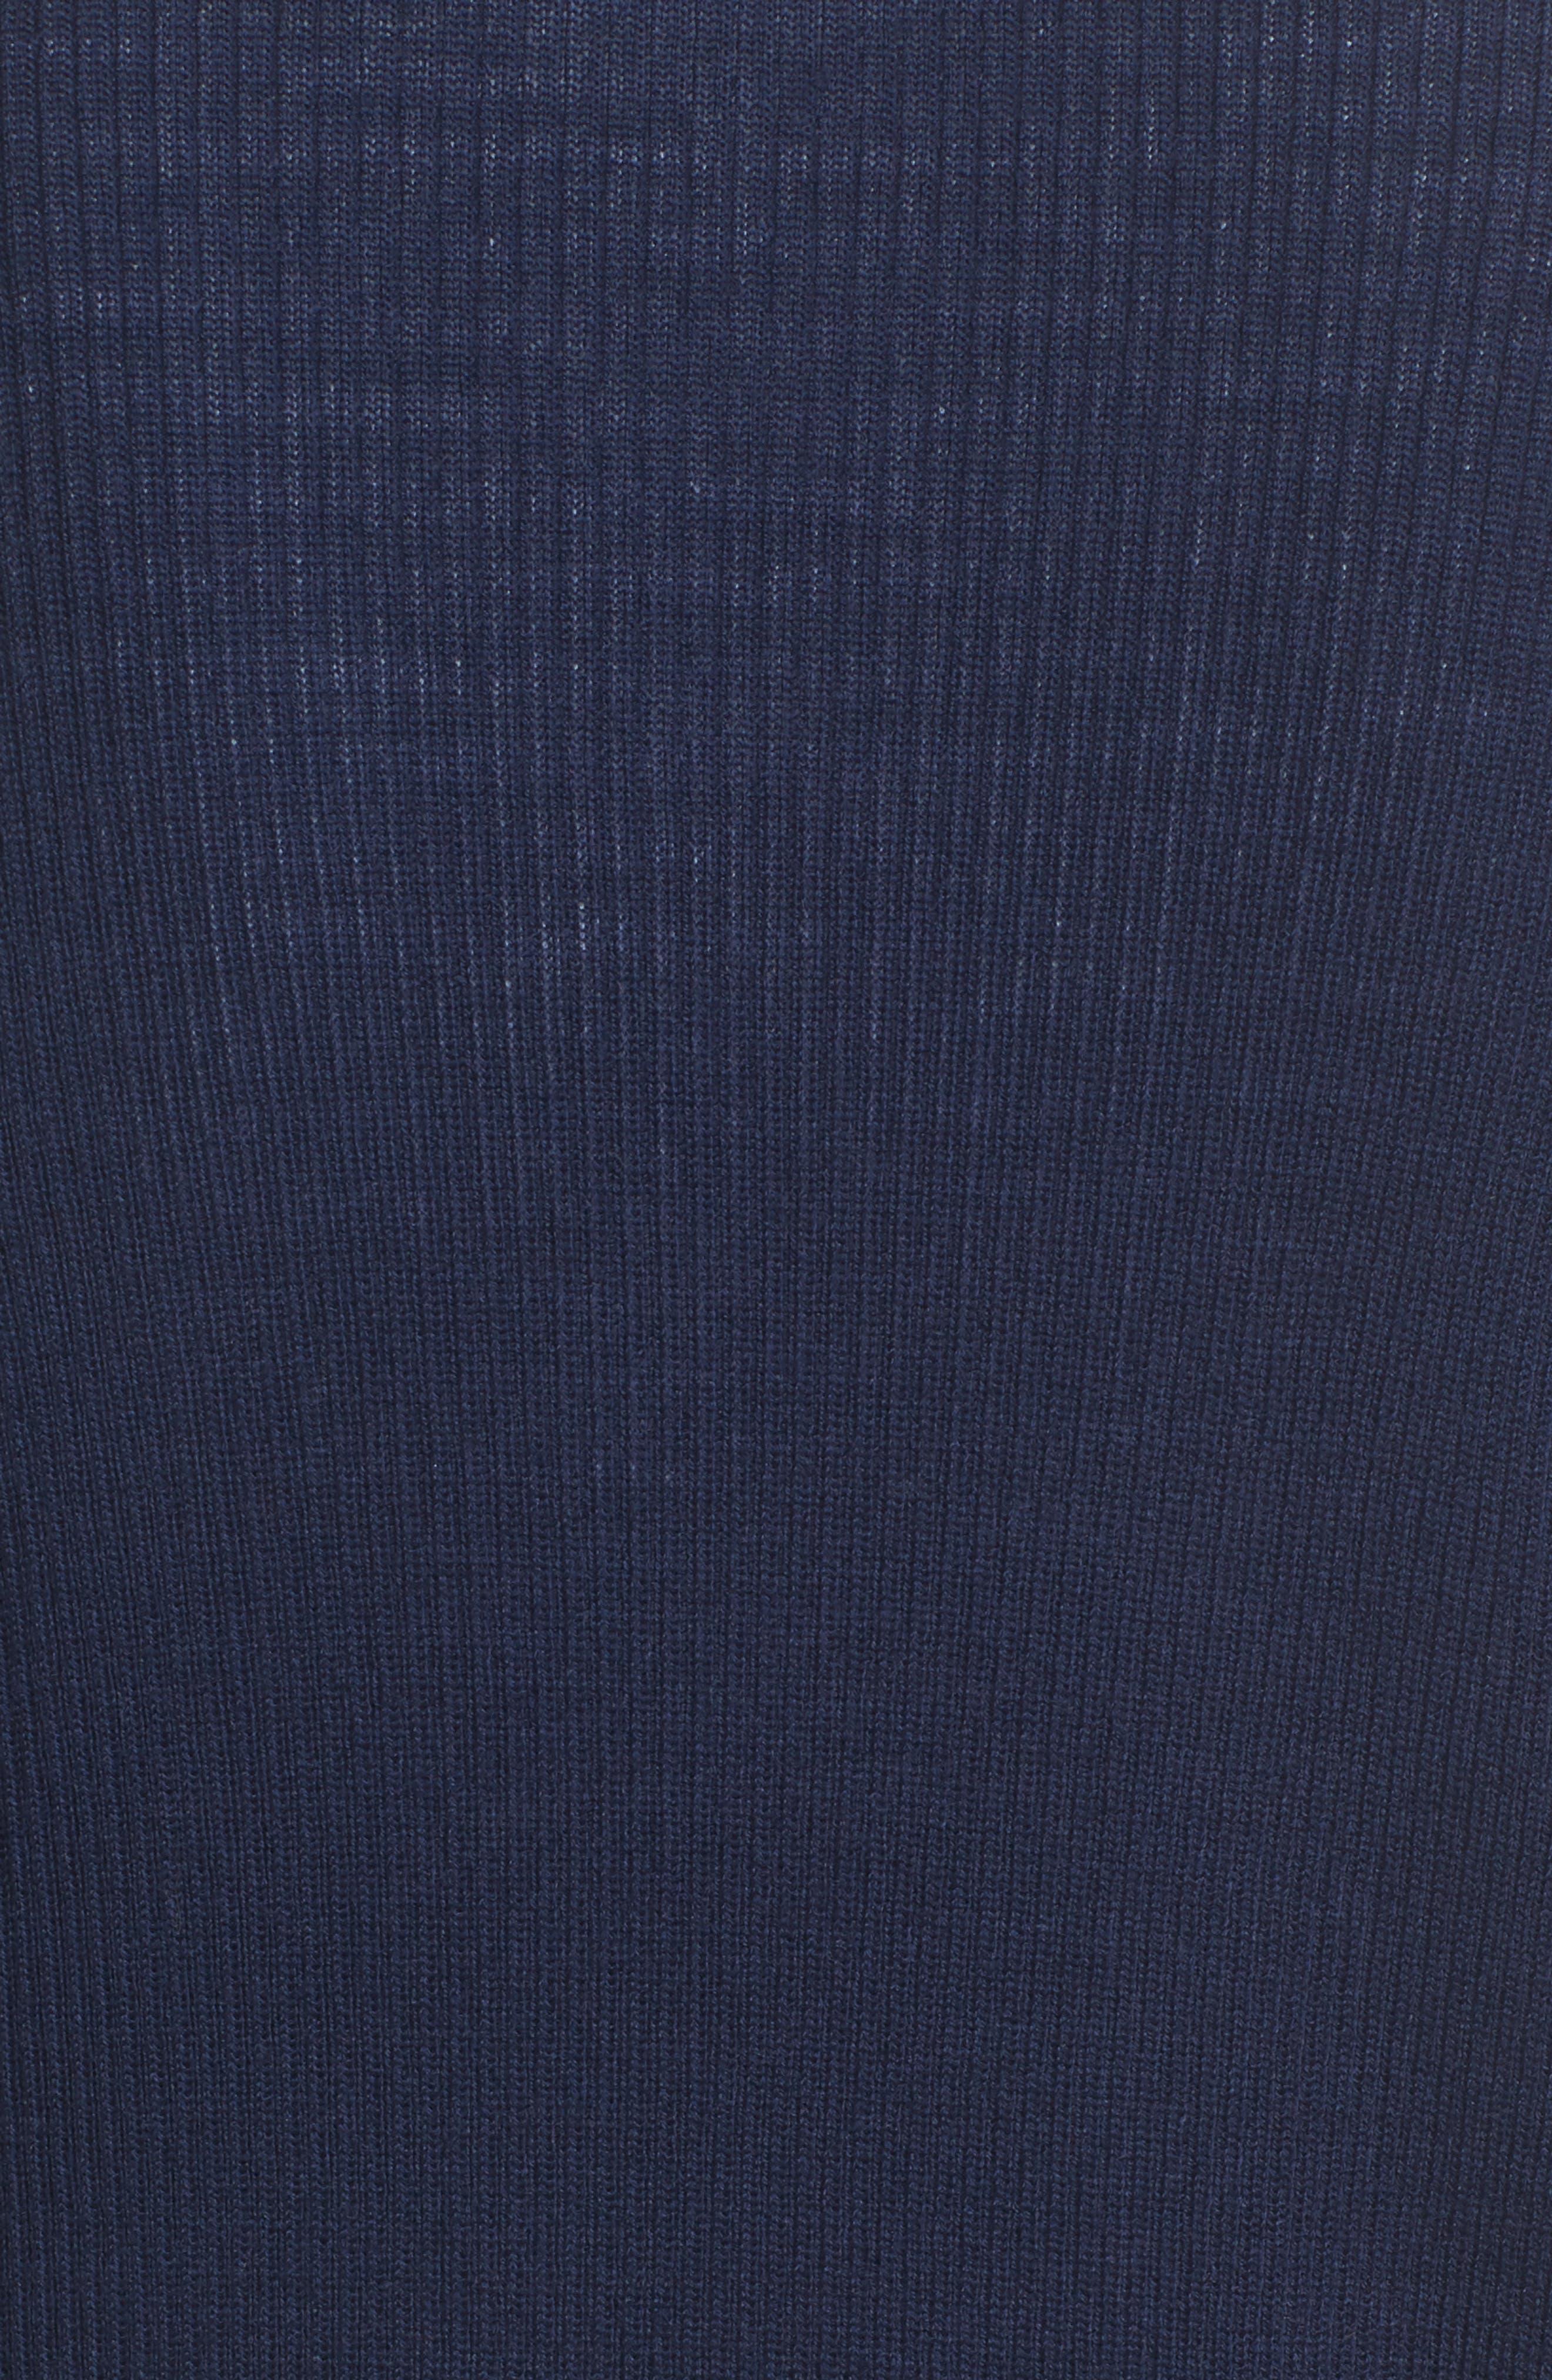 Rib Knit Wool Blend Cardigan,                             Alternate thumbnail 91, color,